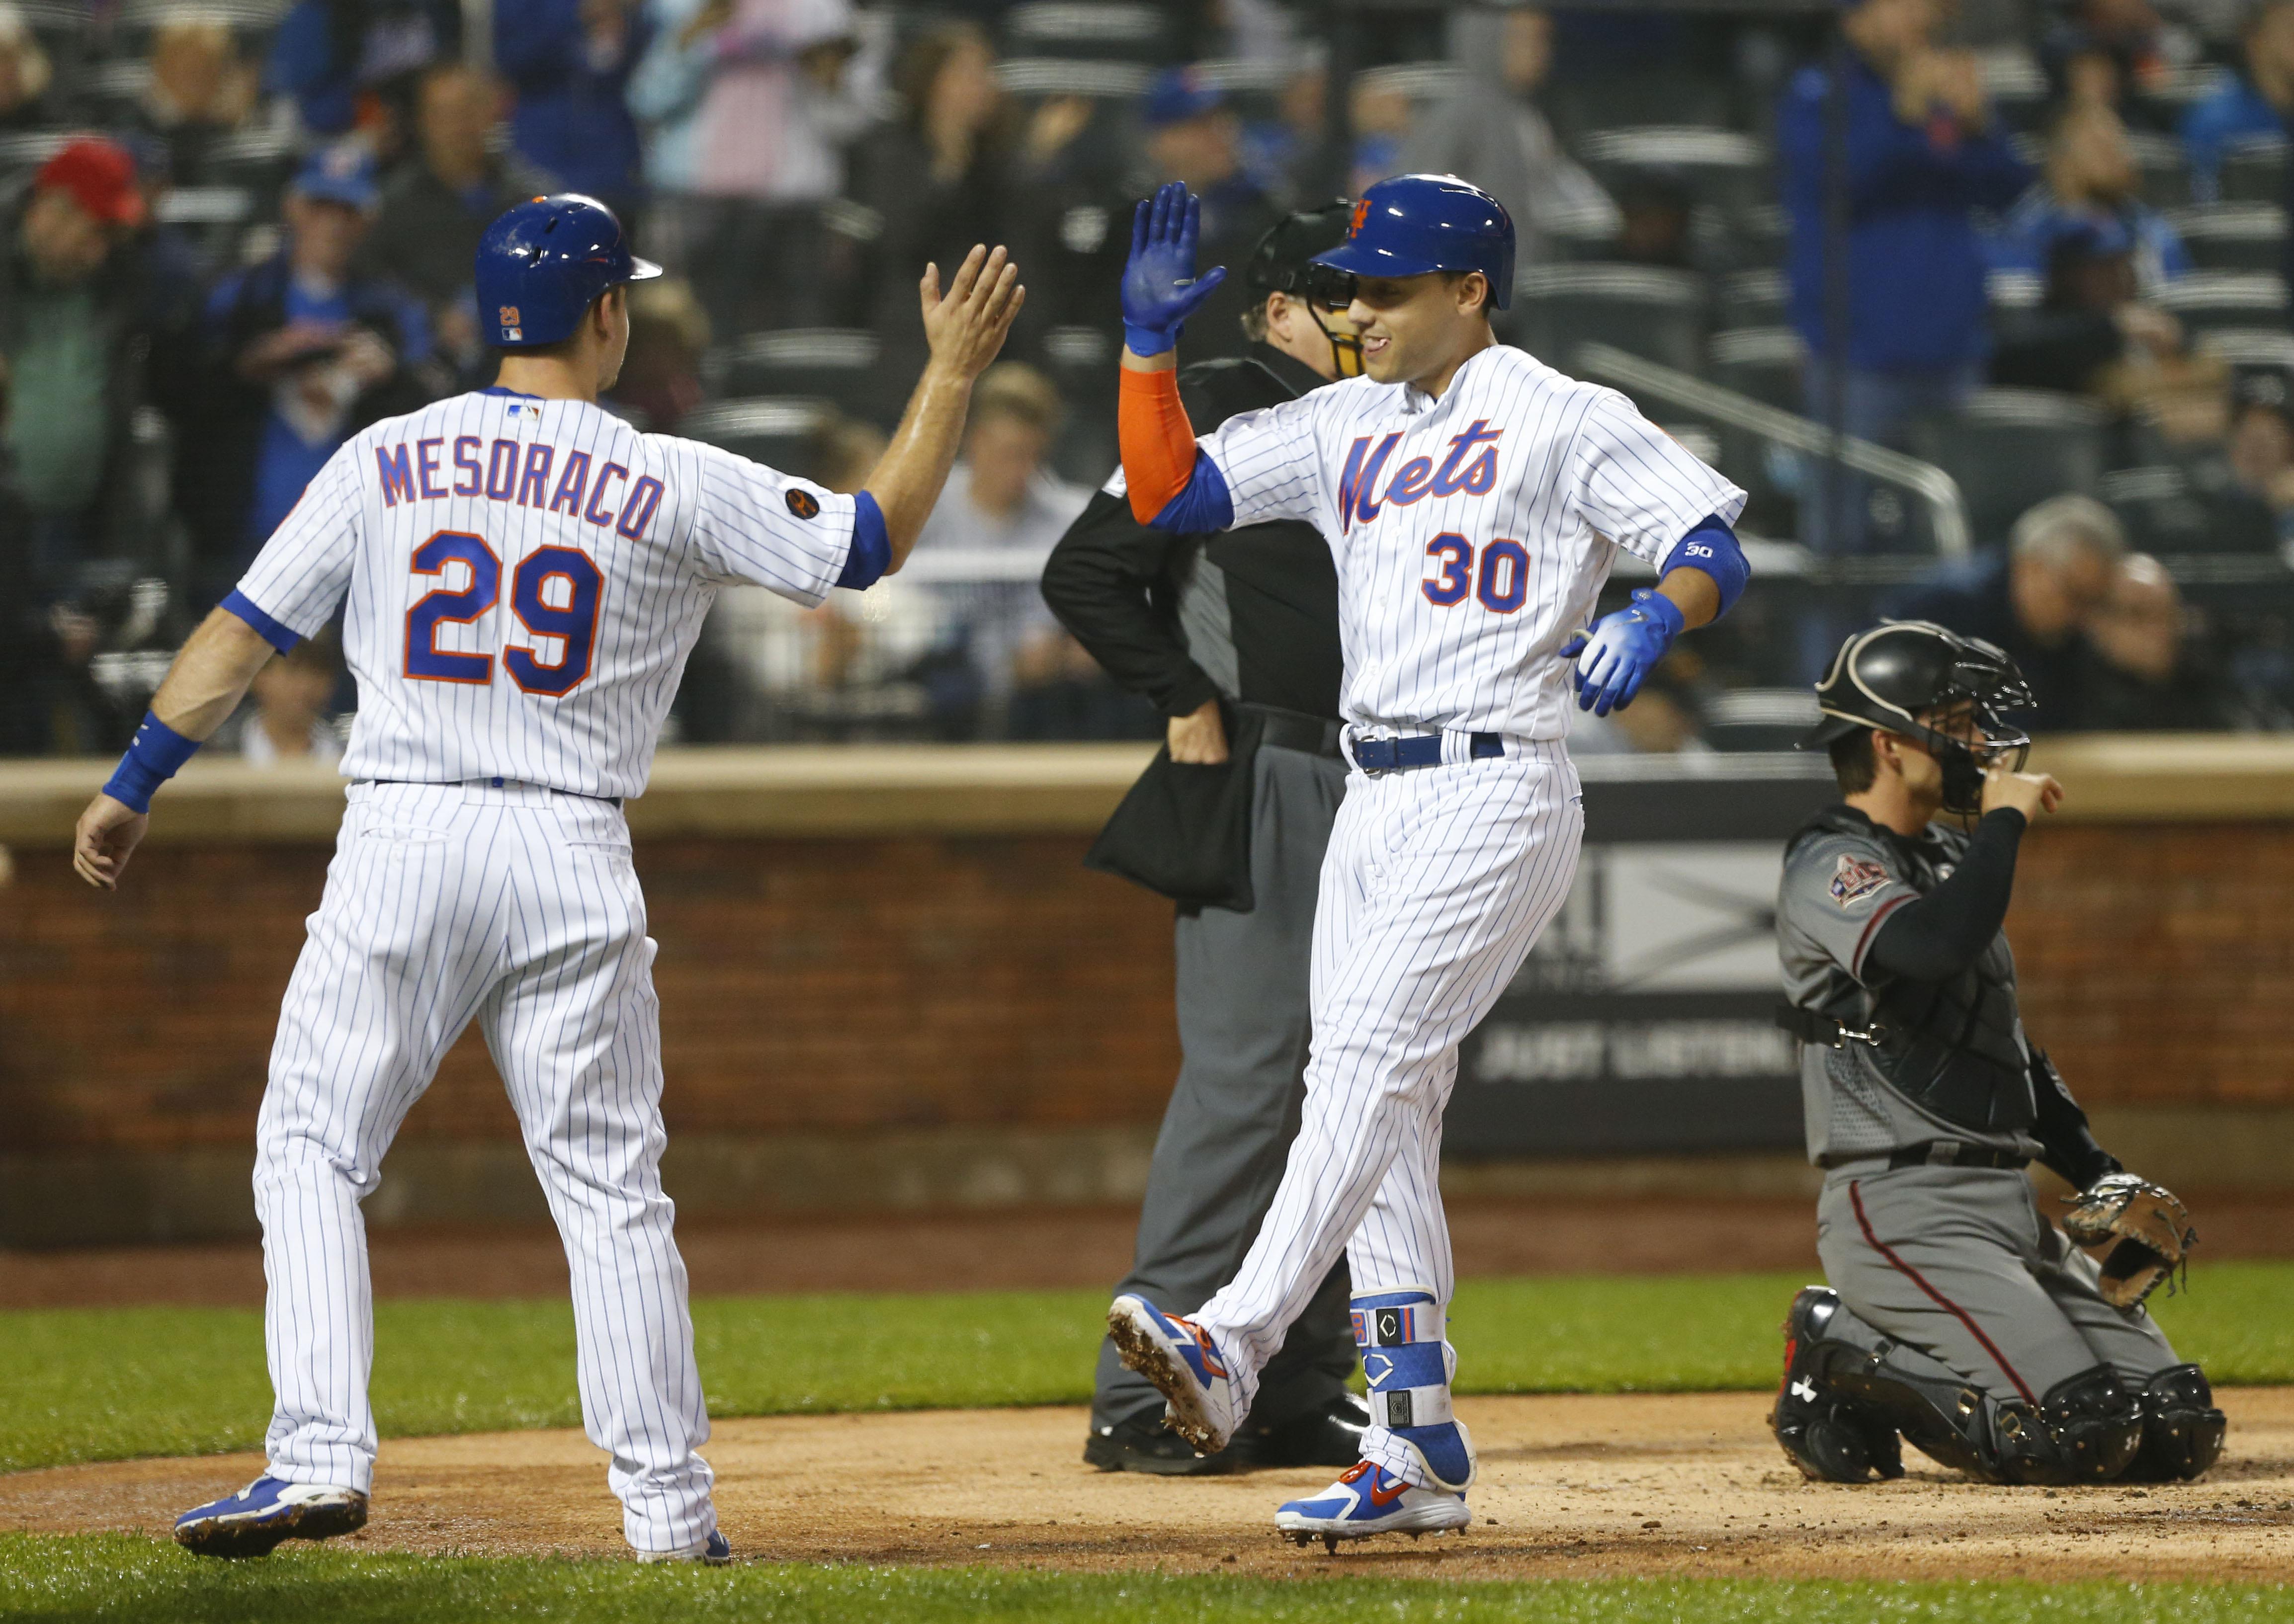 5/20/18 Game Preview: Arizona Diamondbacks at New York Mets